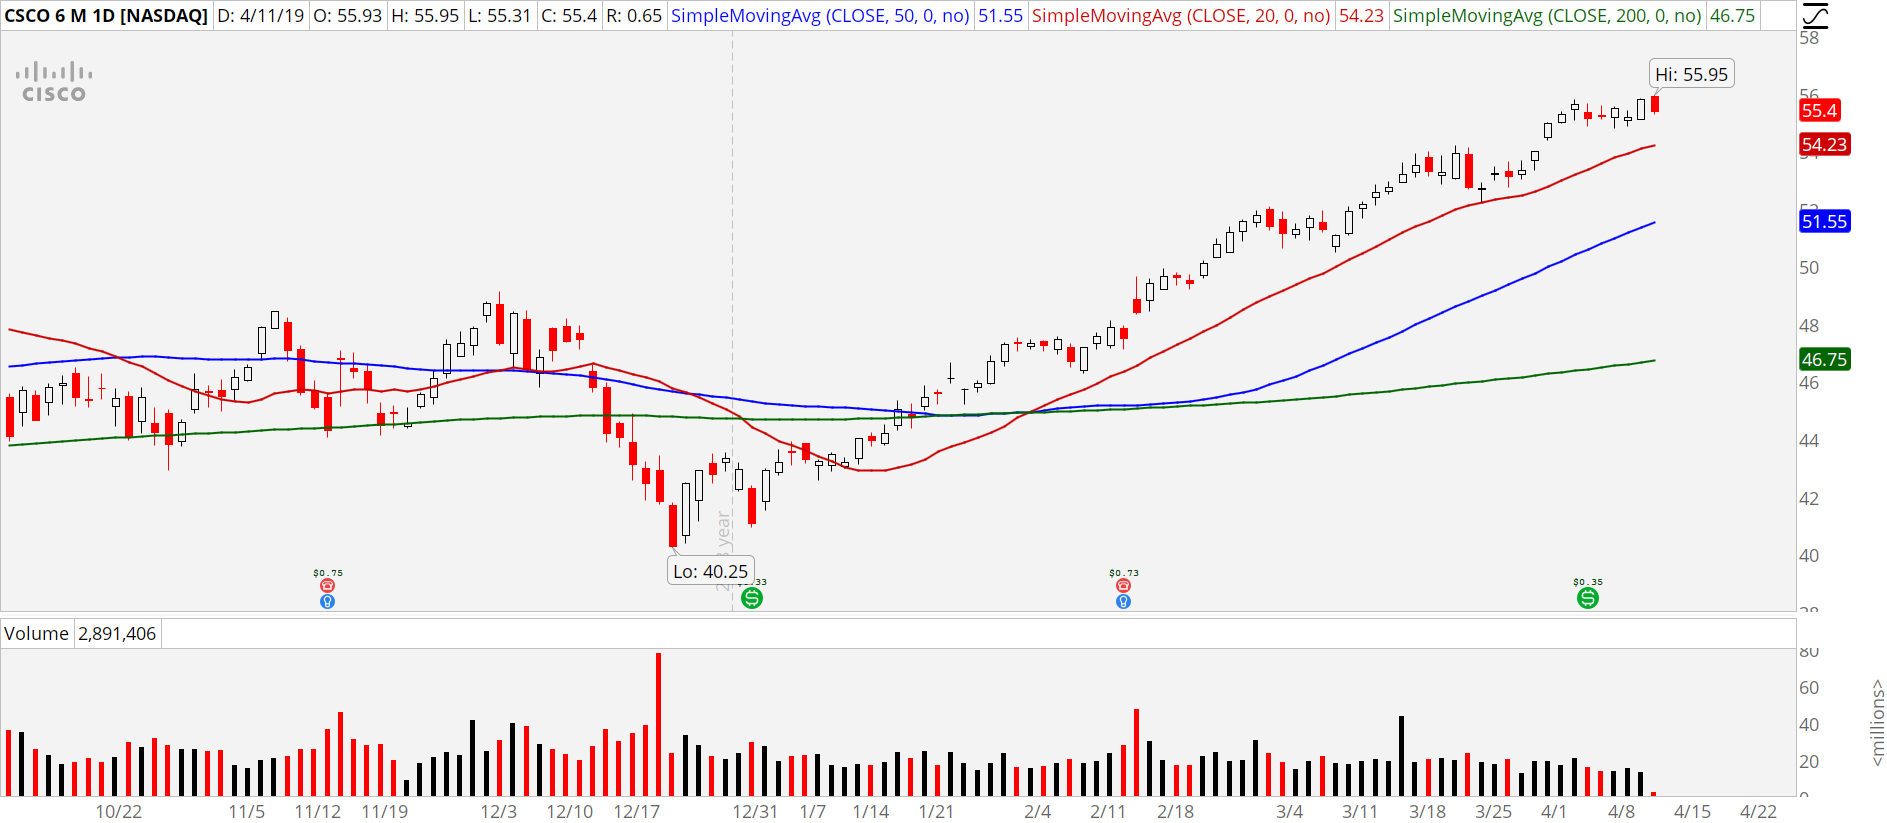 Stocks to Buy at New Highs: Cisco (CSCO)